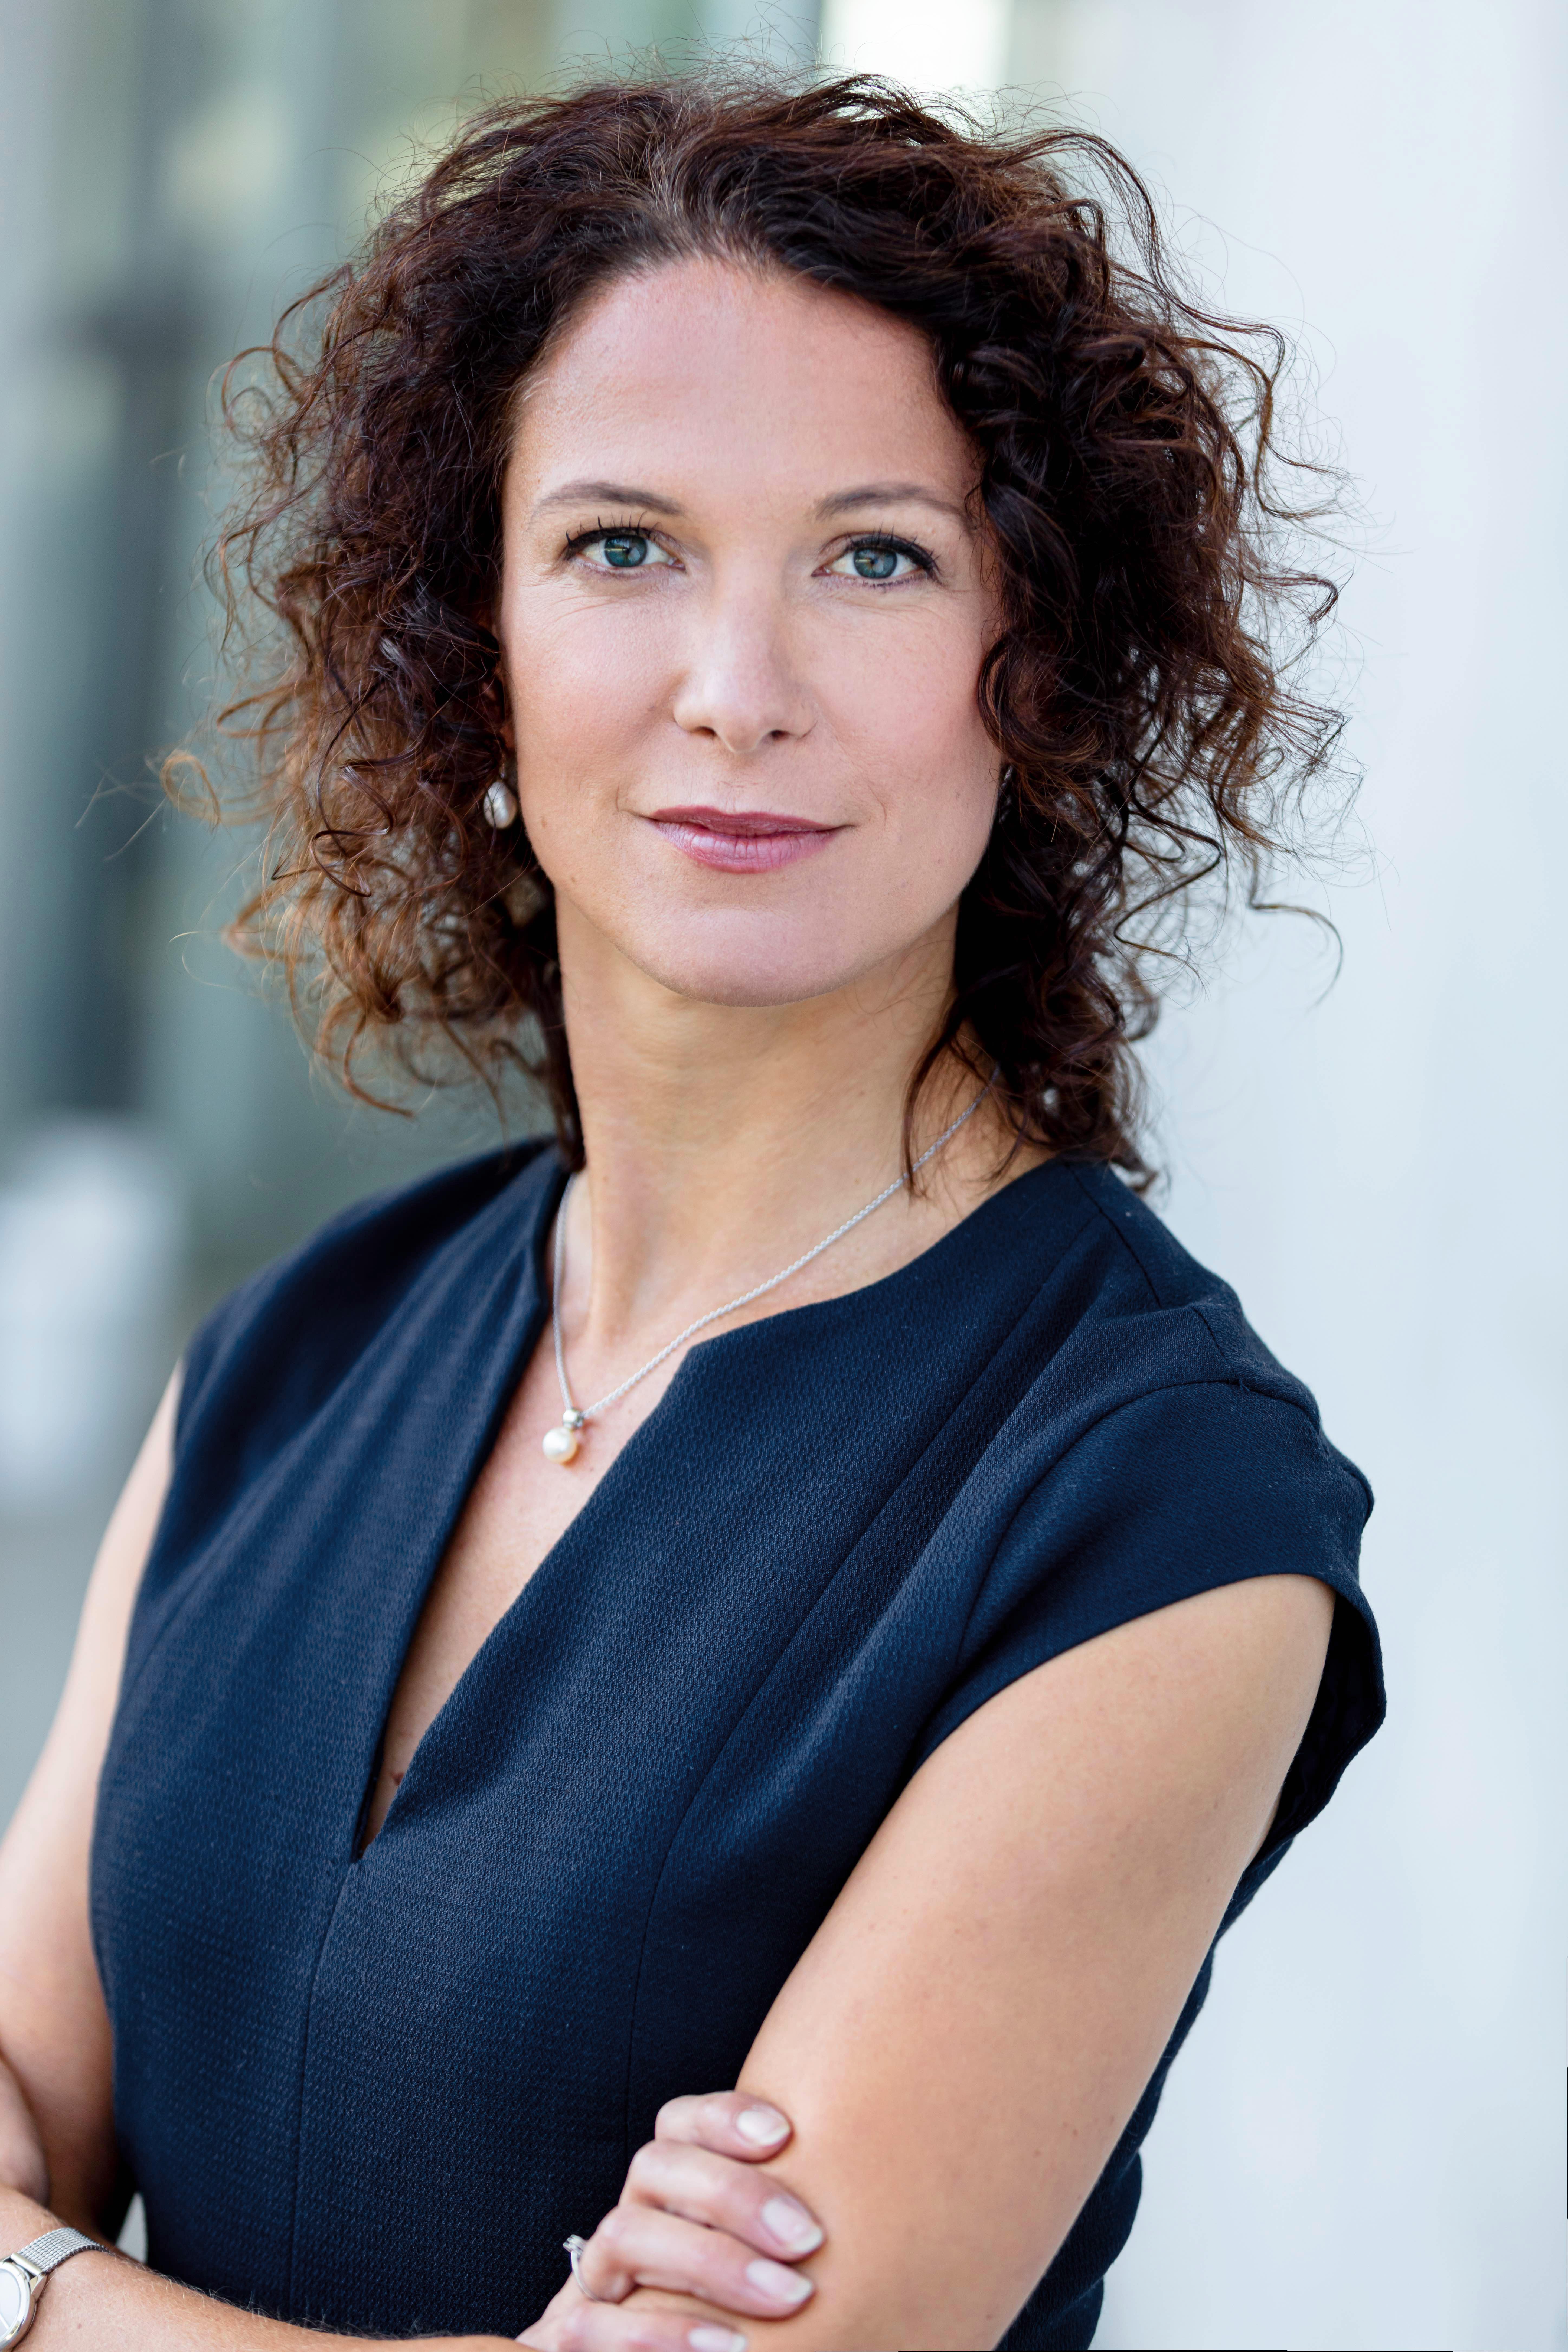 Prof. Dr. Carolin Bock Fachgebietsleitung Entrepreneurship, TU Darmstadt